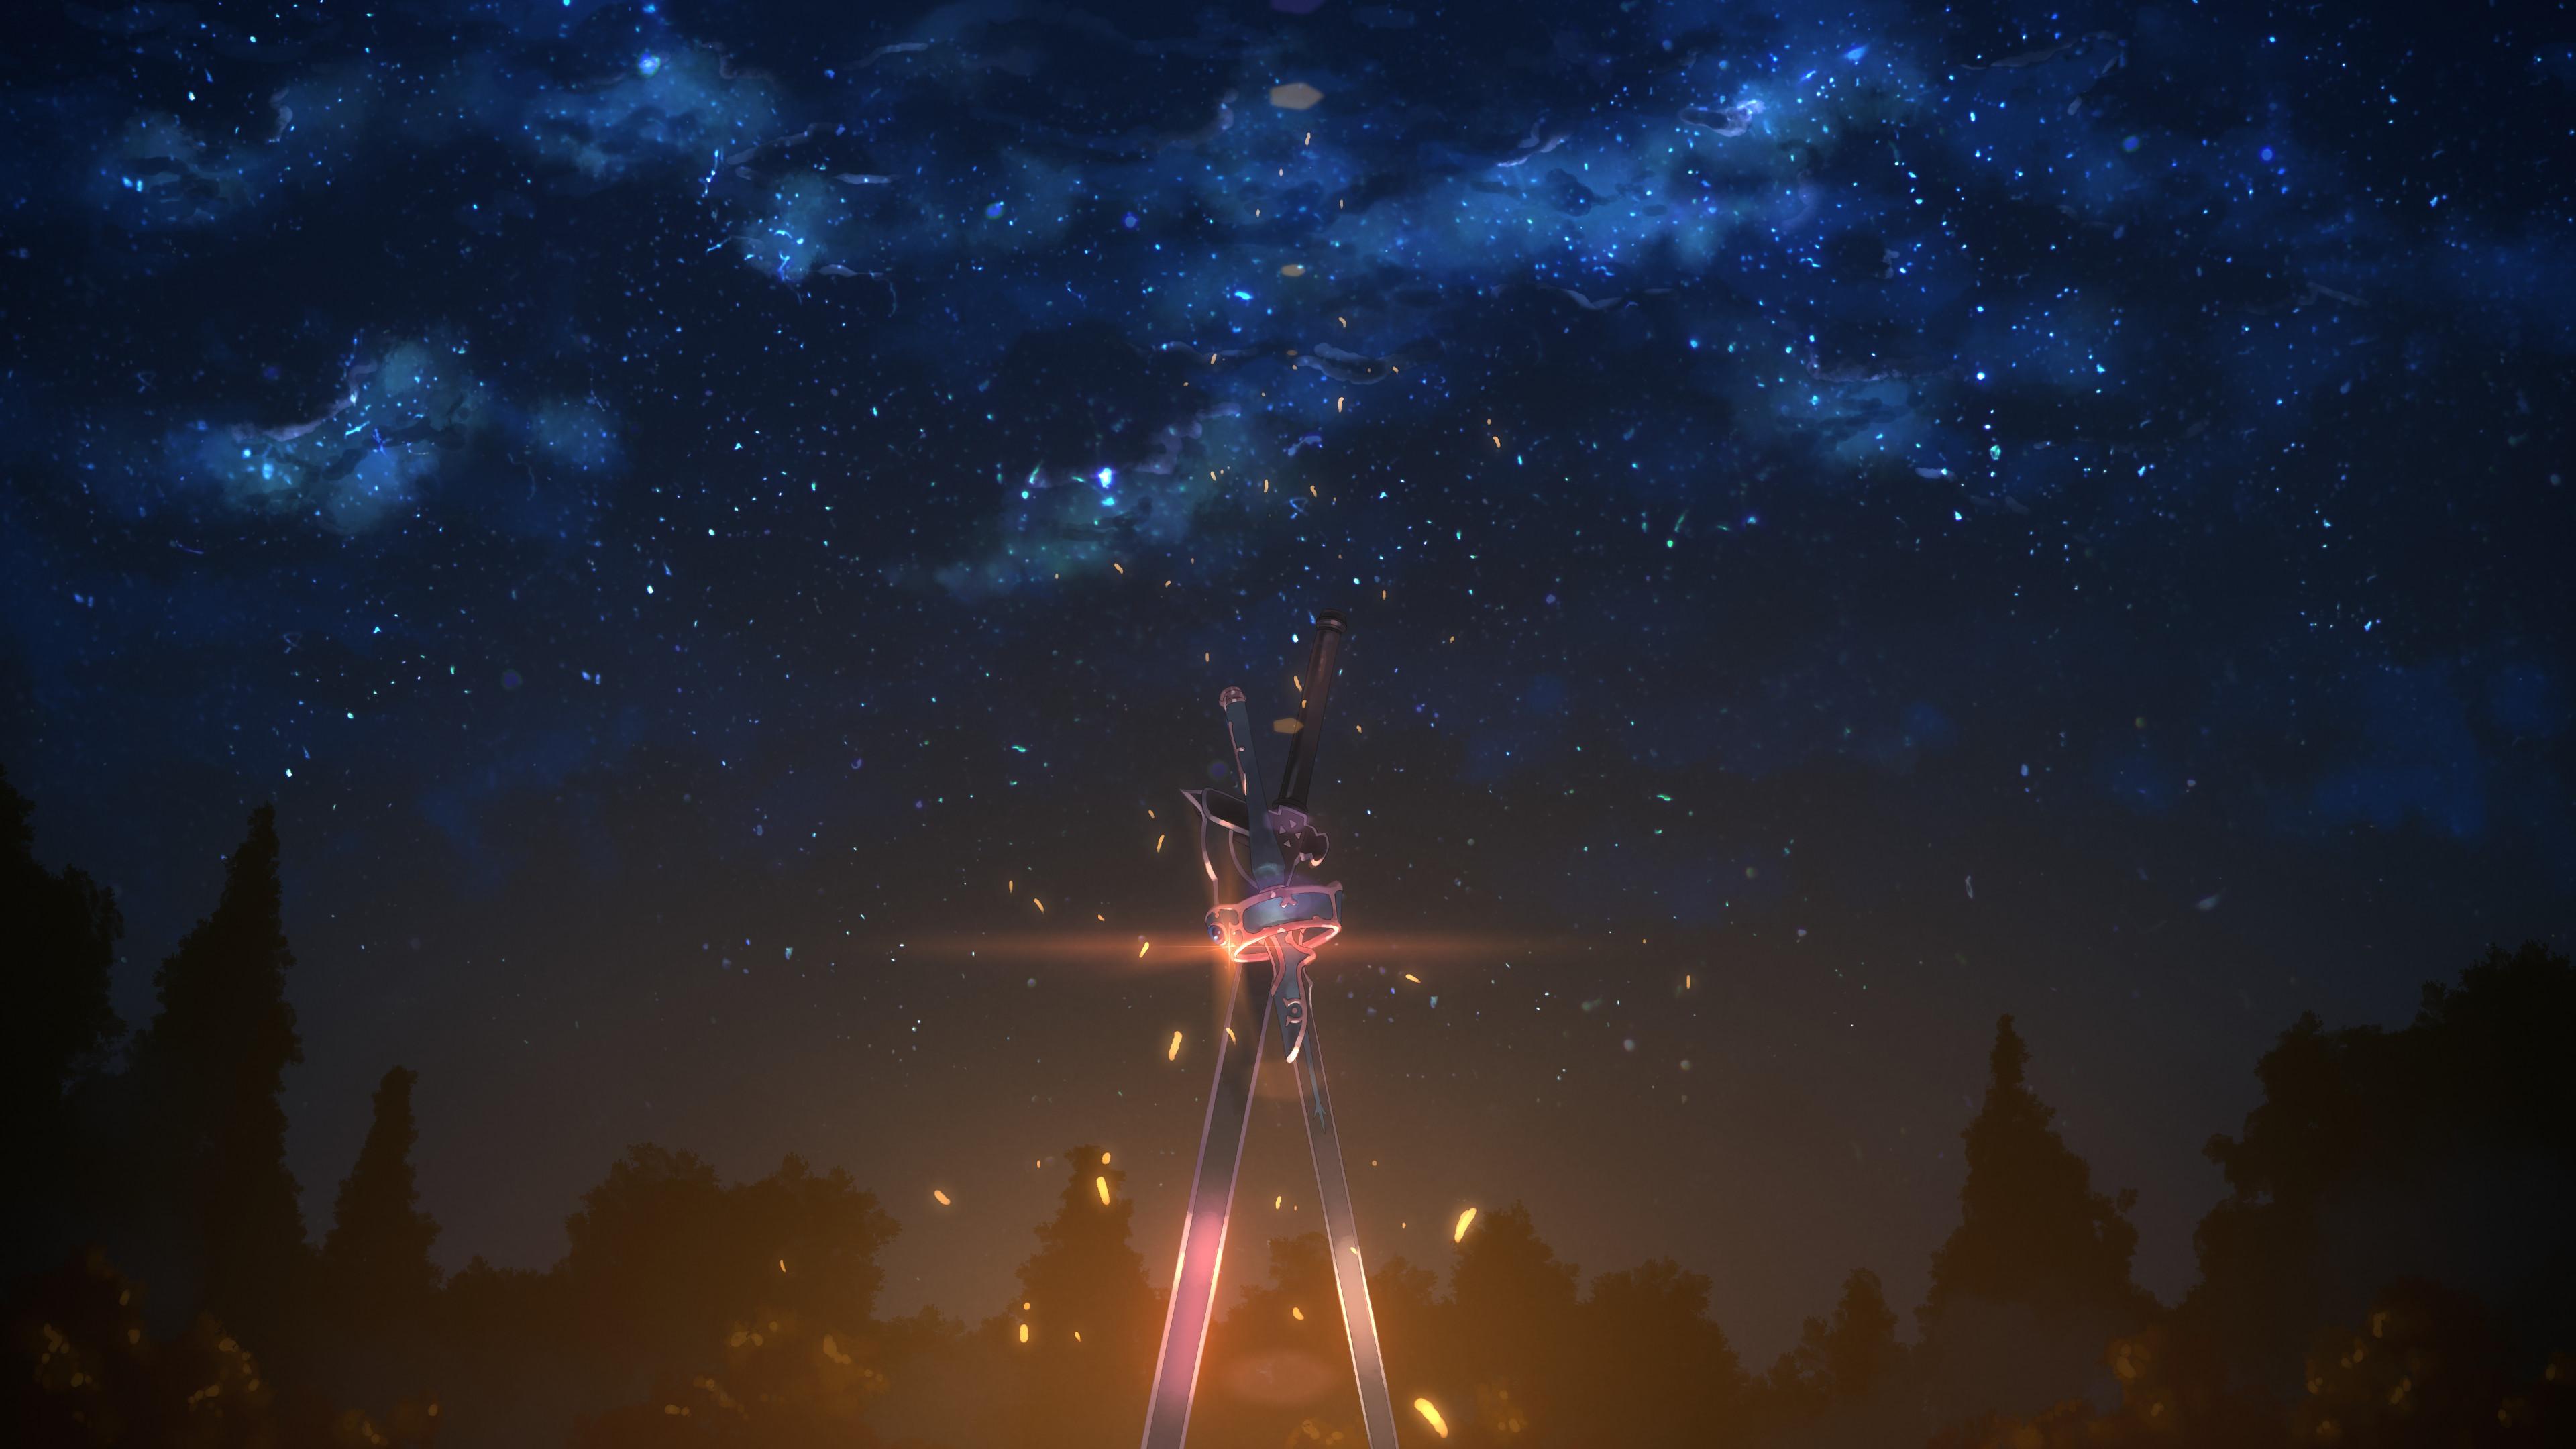 196 4K Ultra HD Sword Art Online Wallpapers   Backgrounds – Wallpaper Abyss